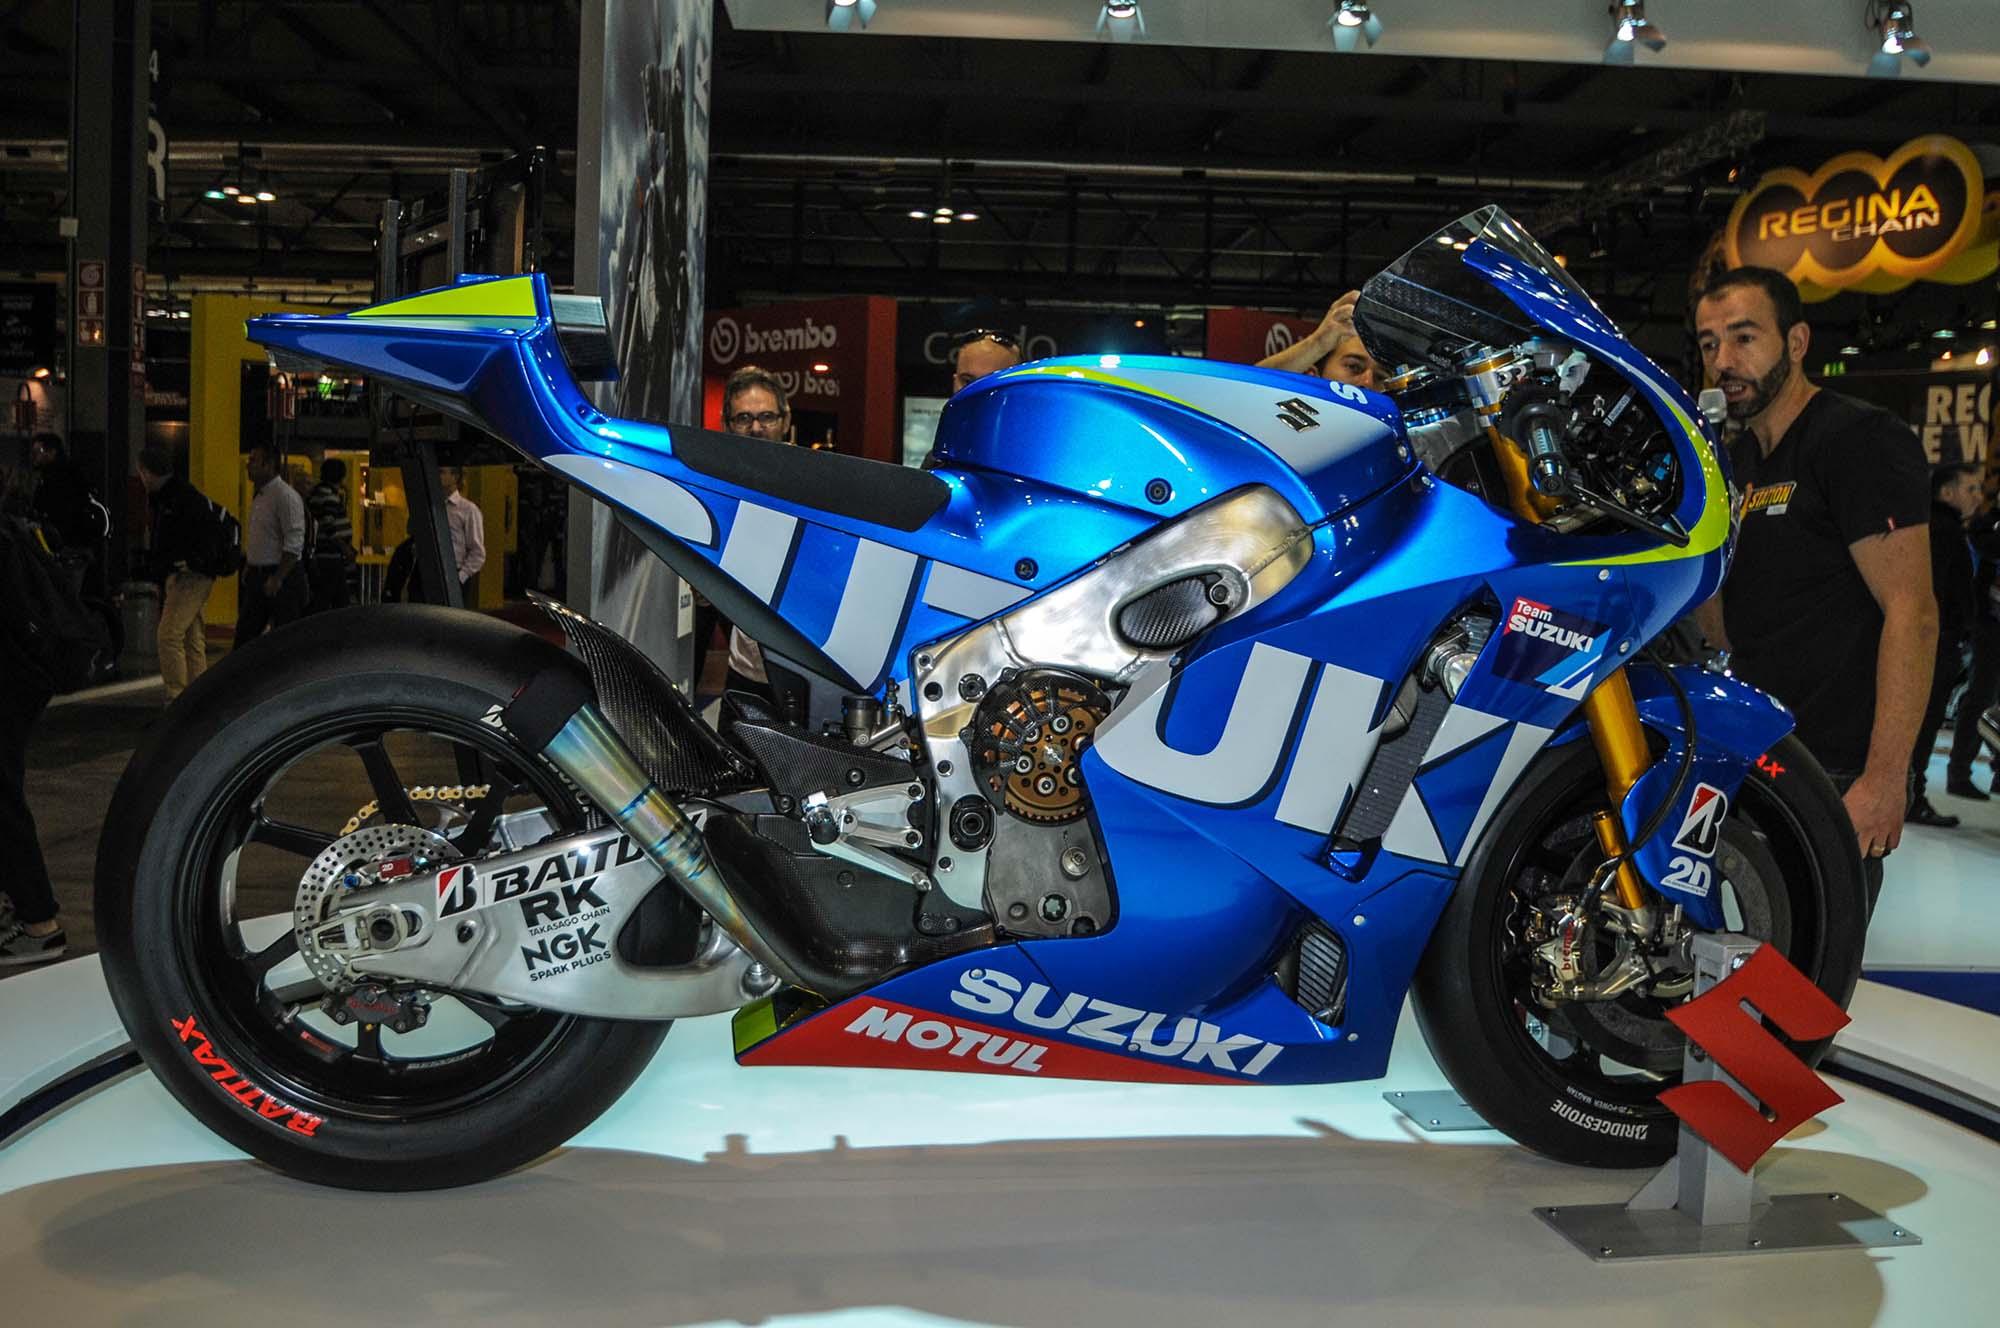 Up-Close with the Suzuki XRH-1 MotoGP Race Bike - Asphalt & Rubber